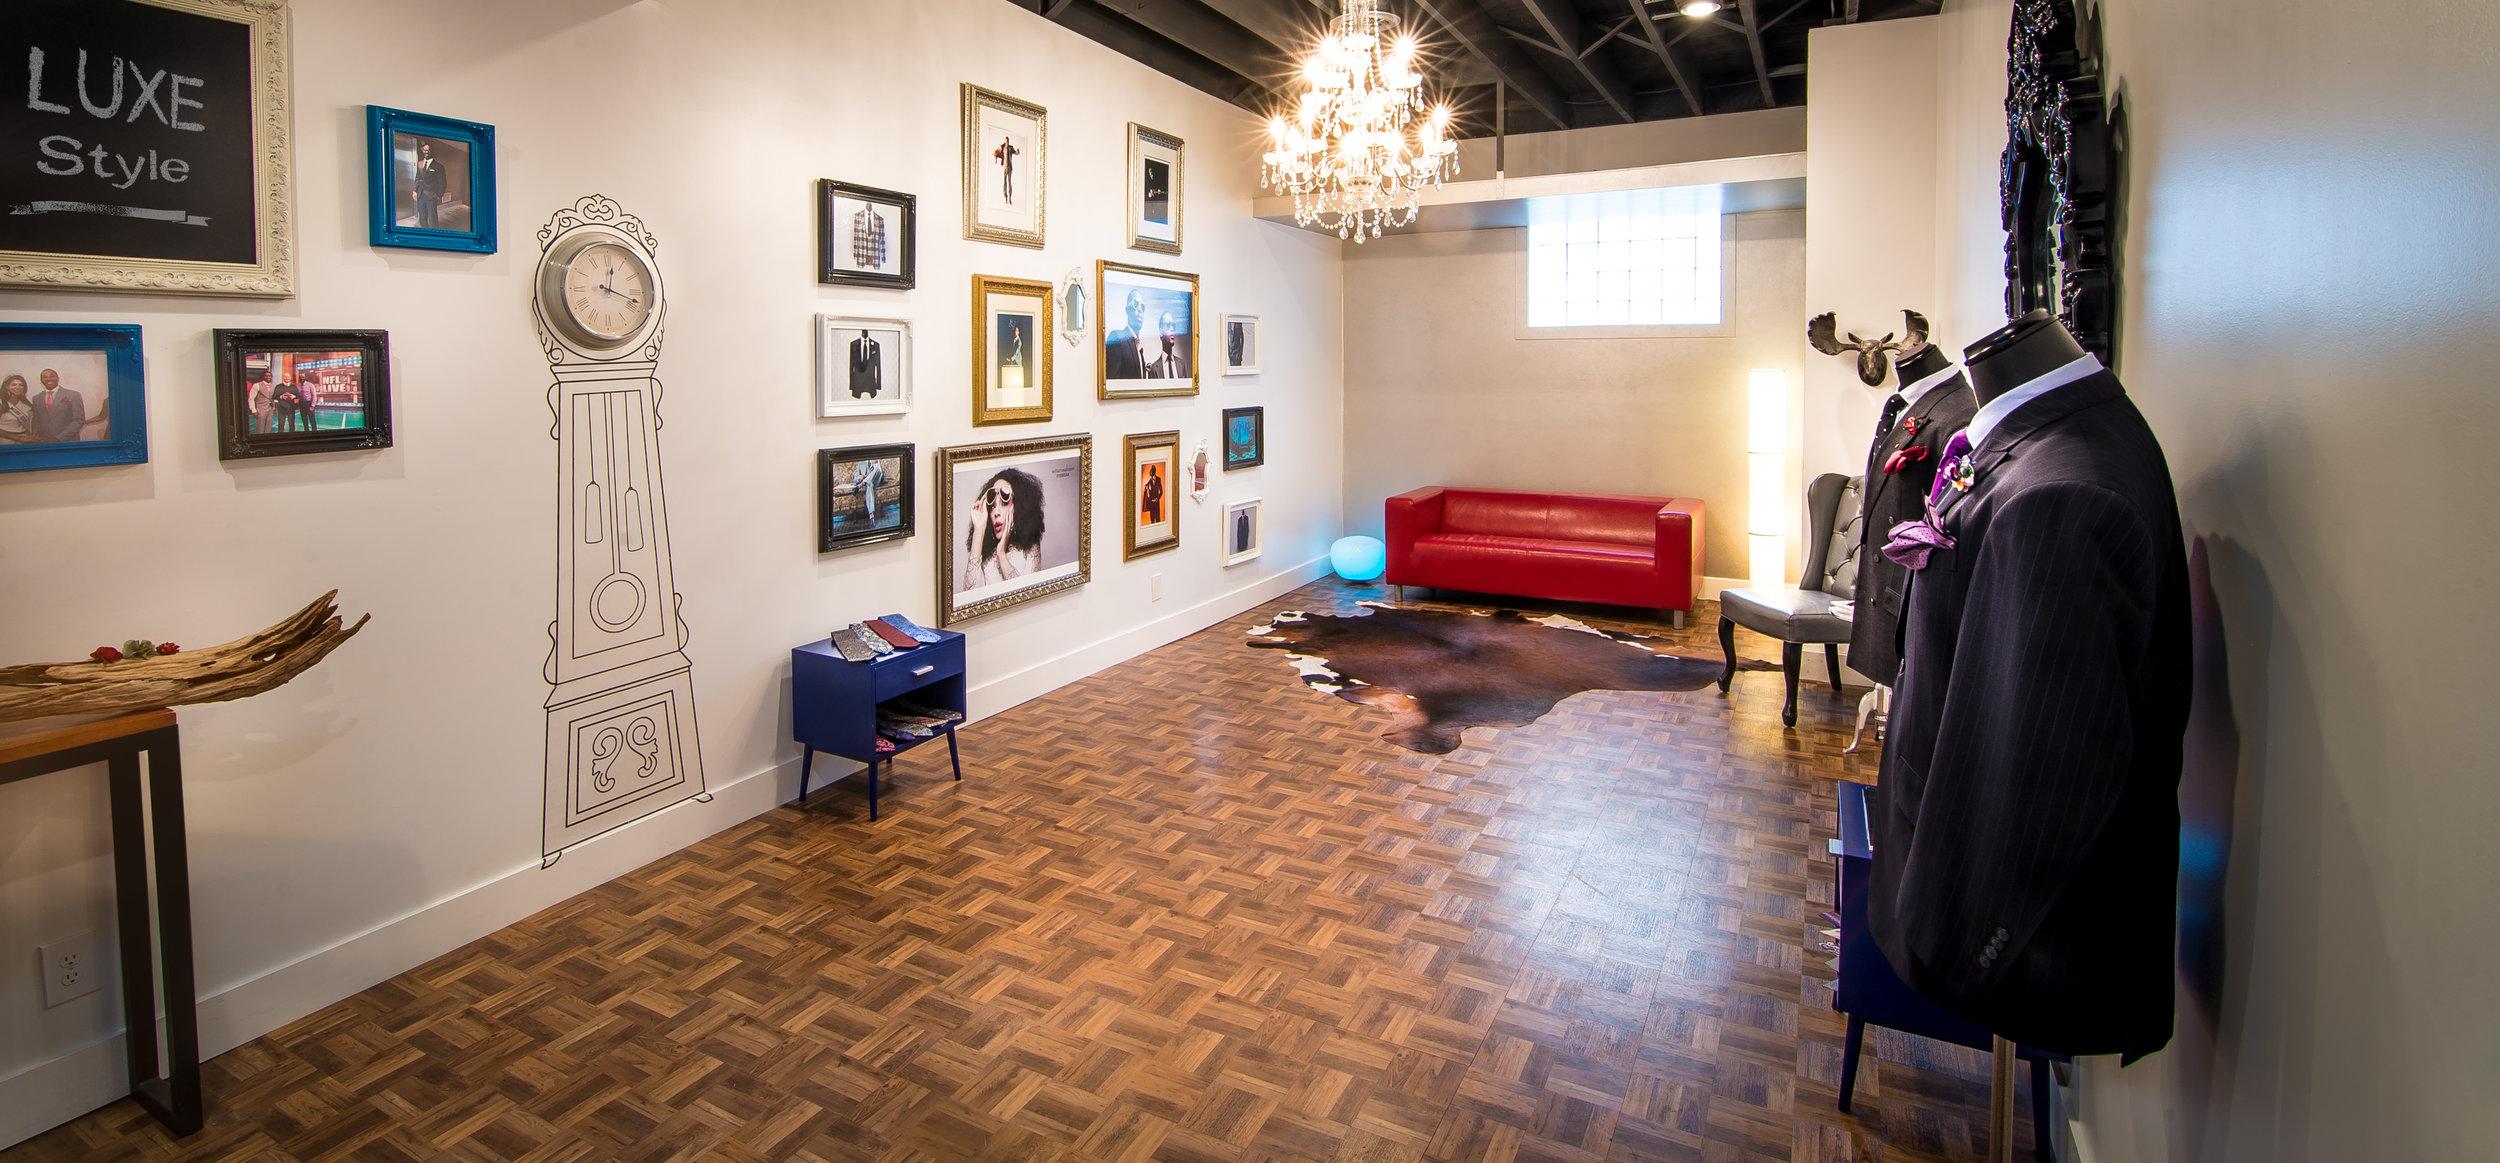 William Malcolm Luxe Collection Design Studio